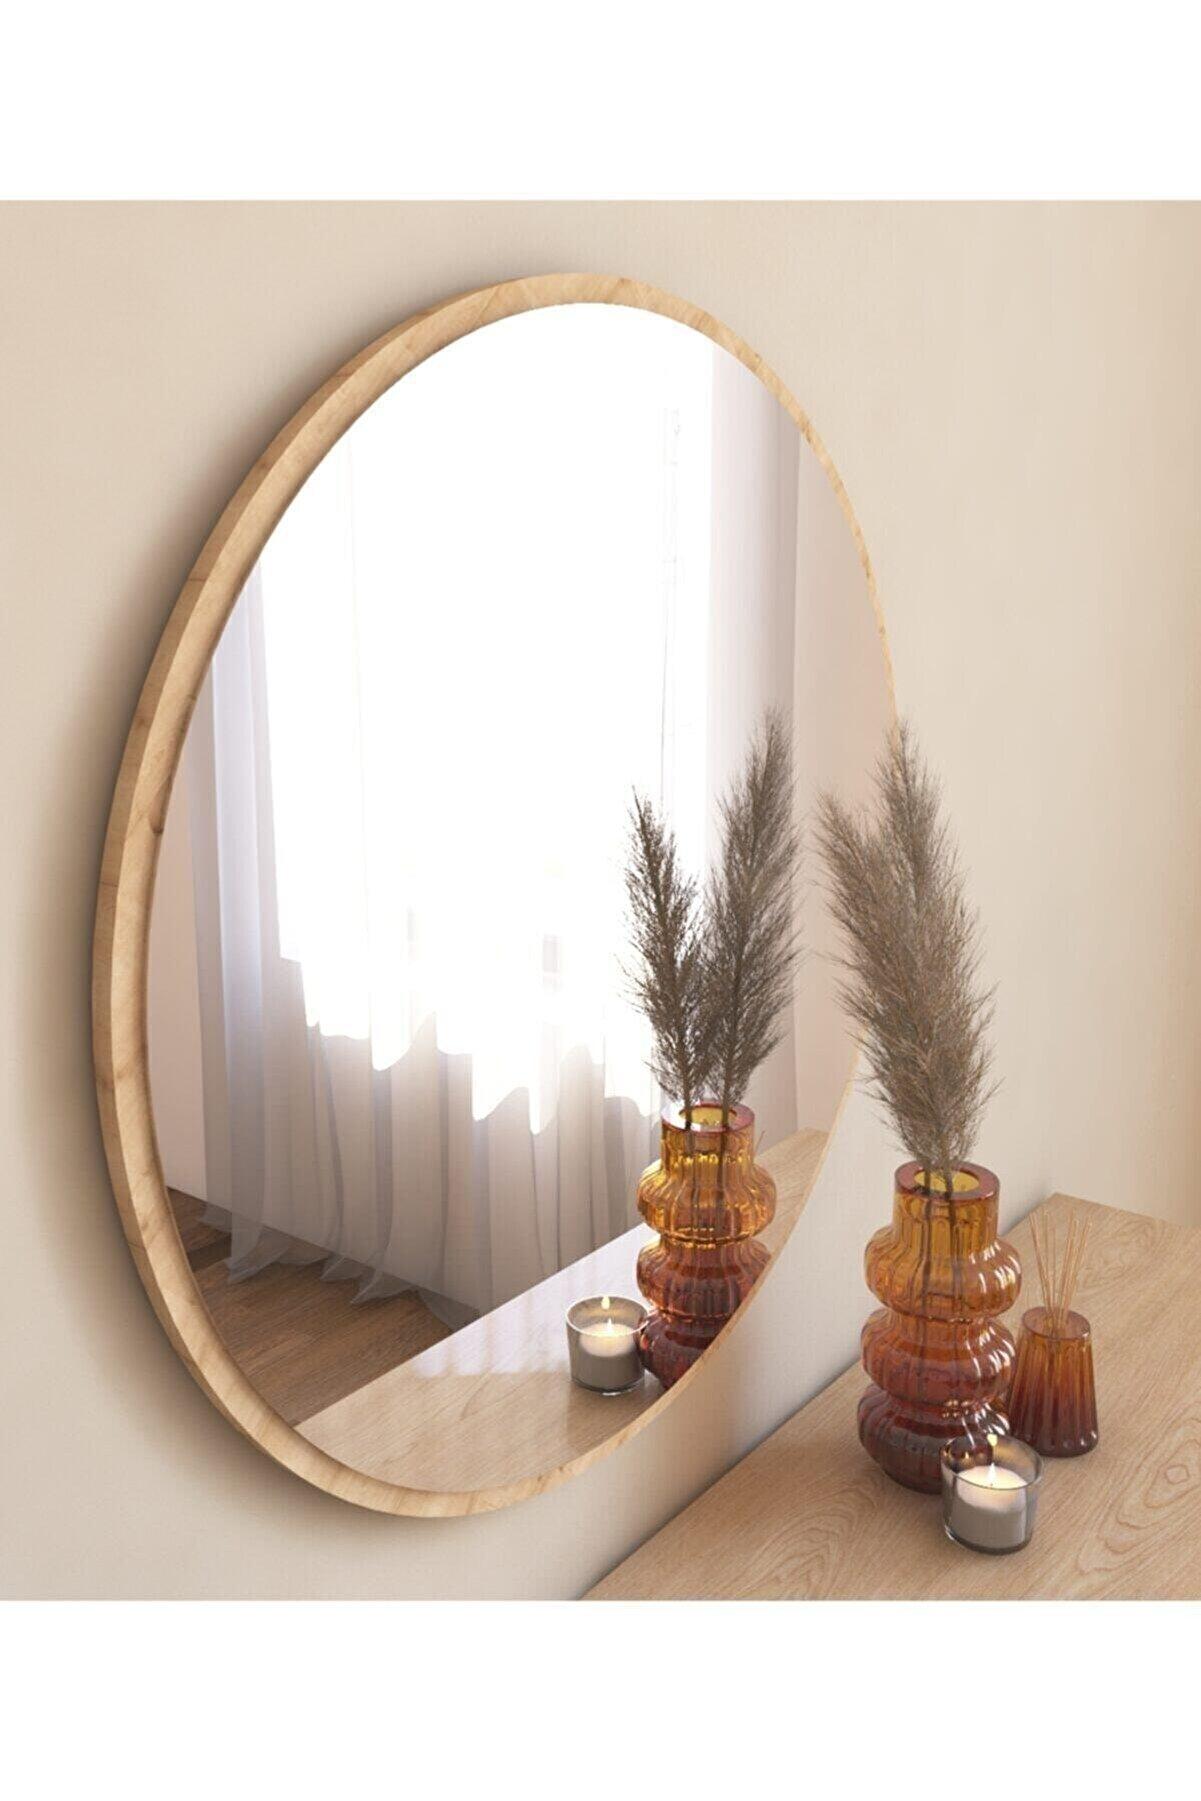 TARZDESİGN 58 Cm Safir Meşe Dekoratif Yuvarlak Antre Hol Koridor Duvar Salon Mutfak Banyo Wc Ofis Aynası